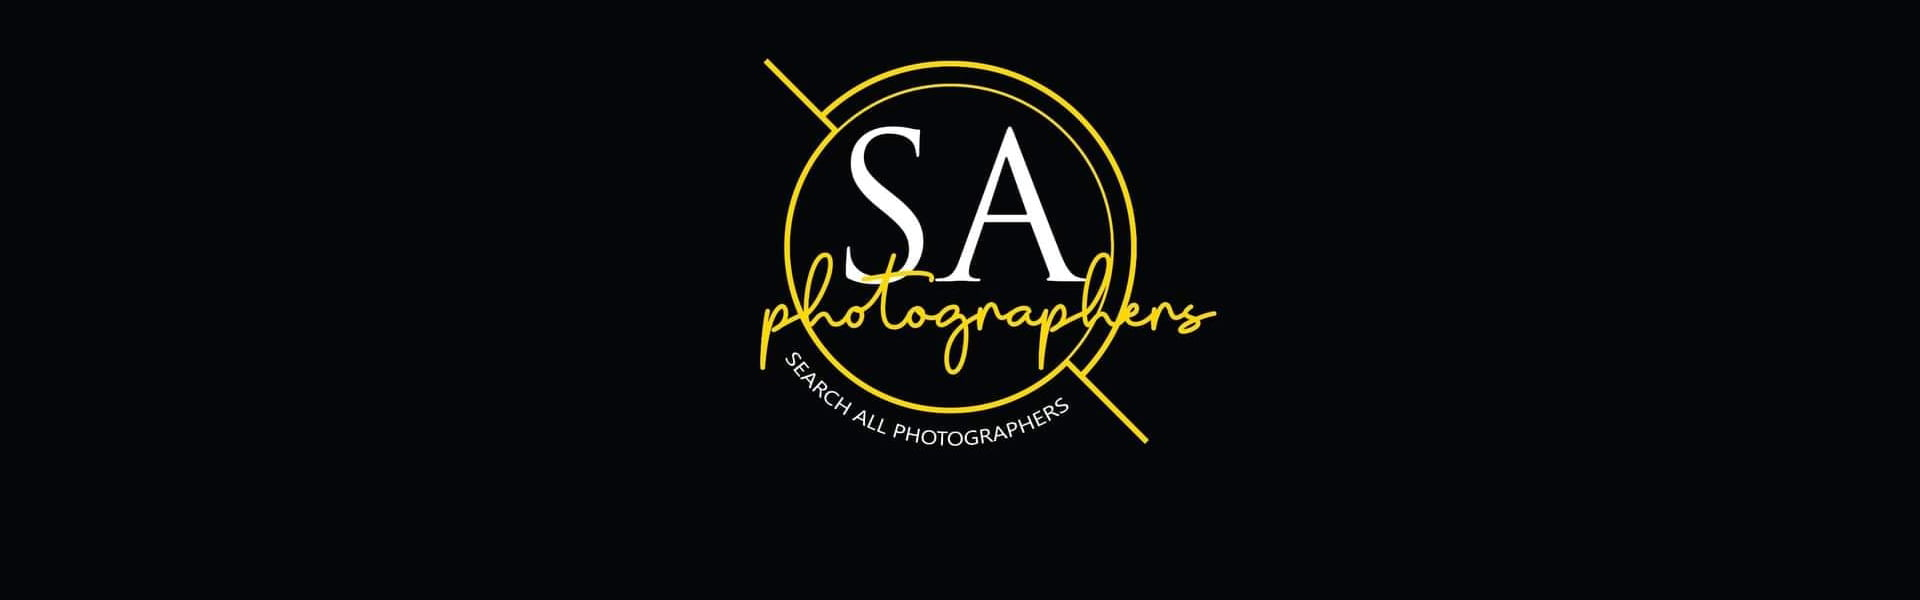 Tattoo Photography SA Photographers